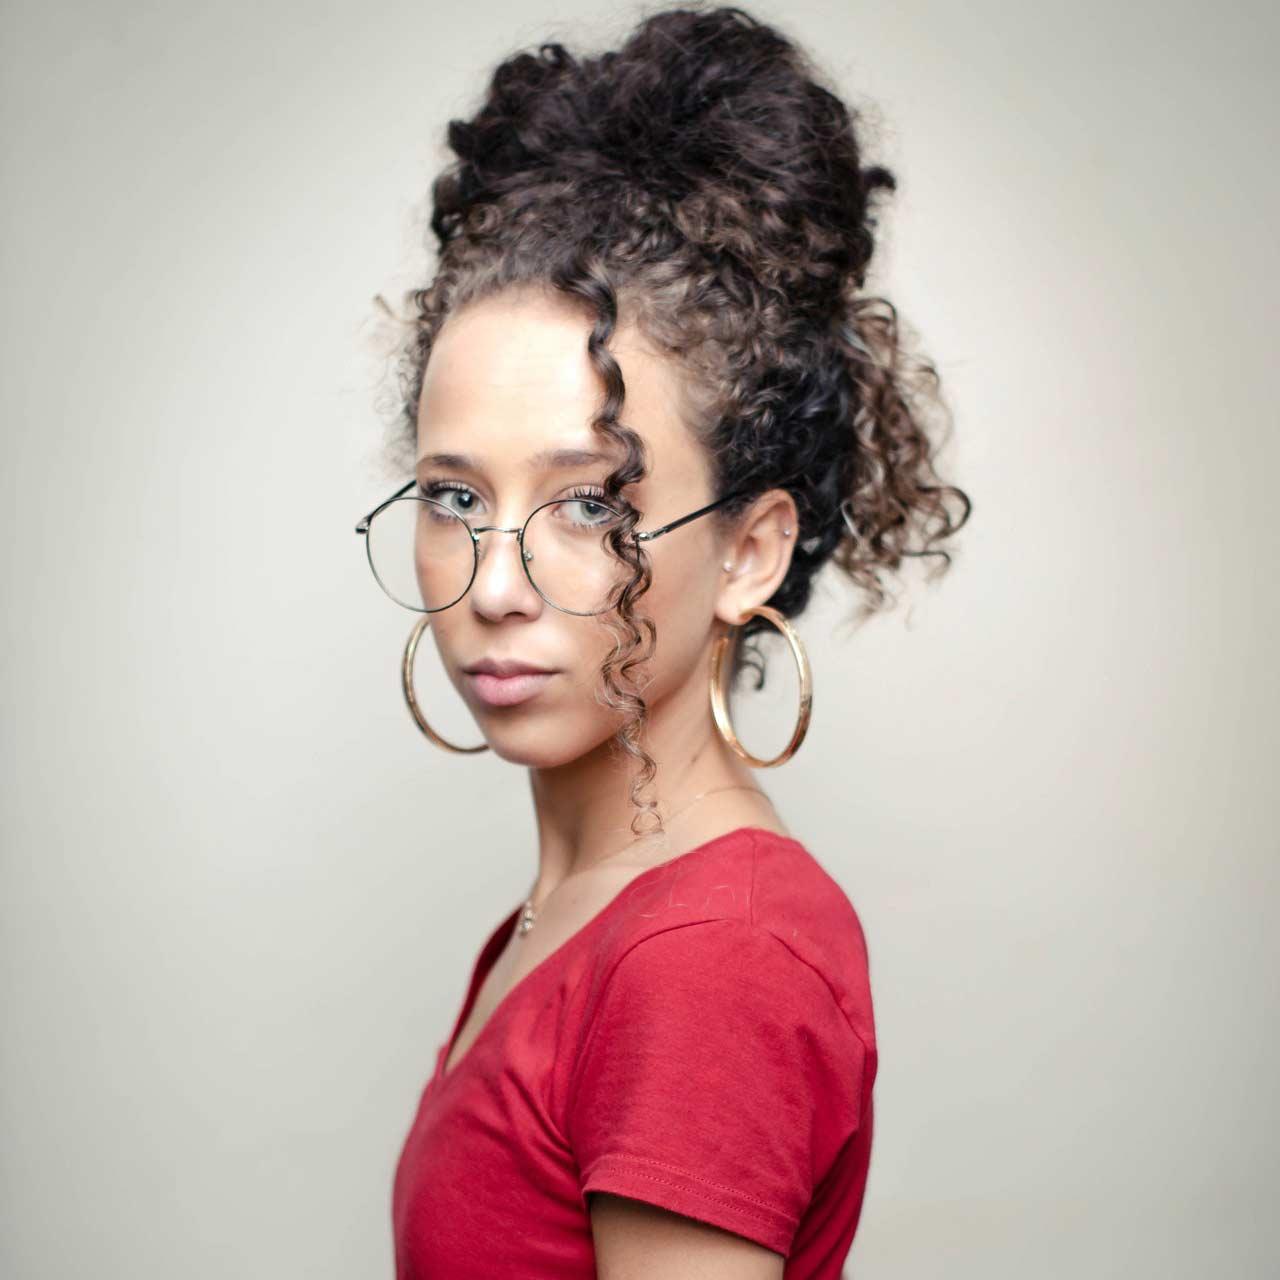 photo-of-woman-wearing-eyeglasses-3319509